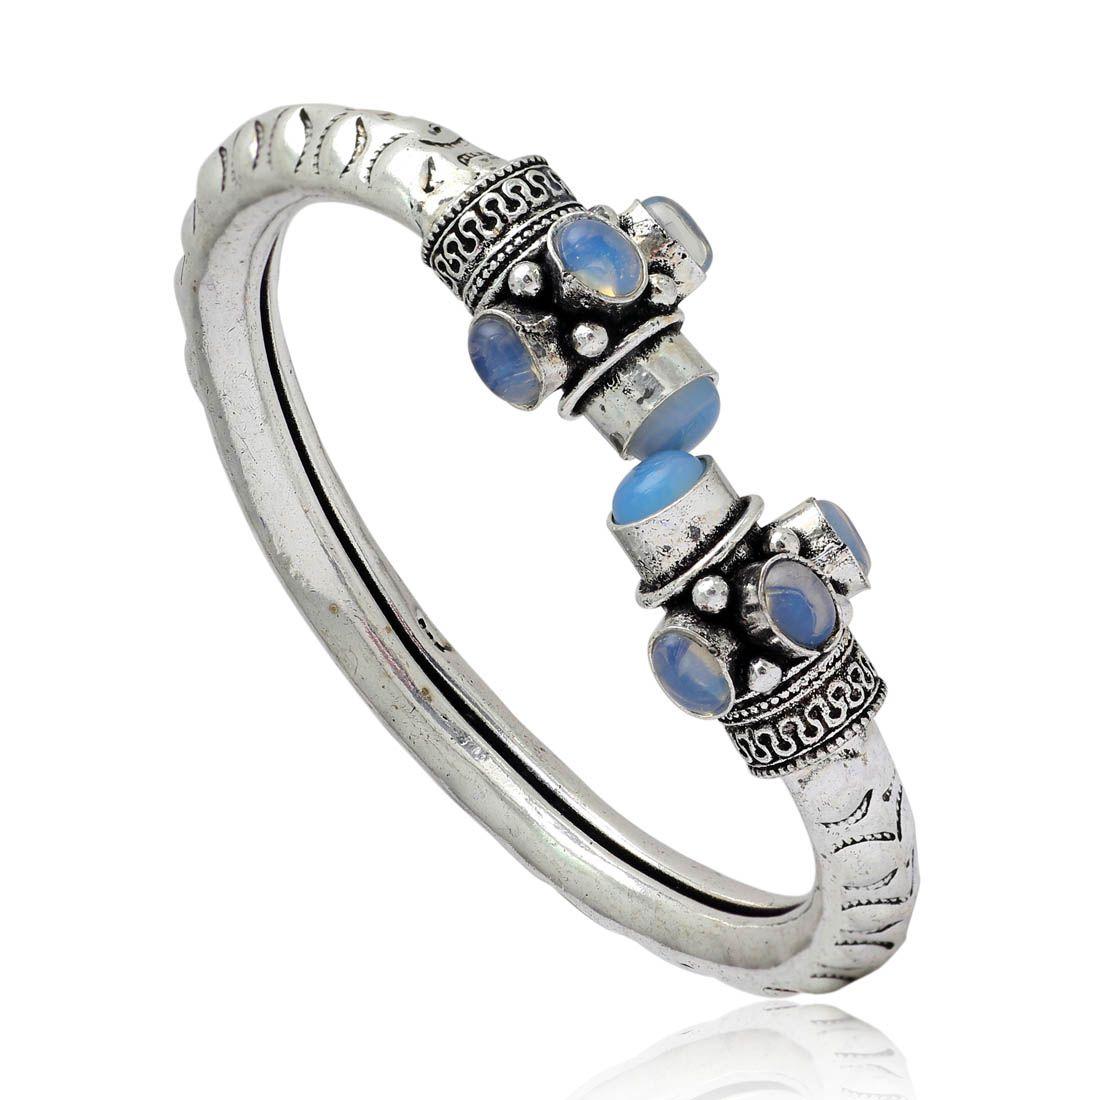 Aqua Color Oxidised Glass Stone Bracelets 1 Piece (GSB83AQUA)